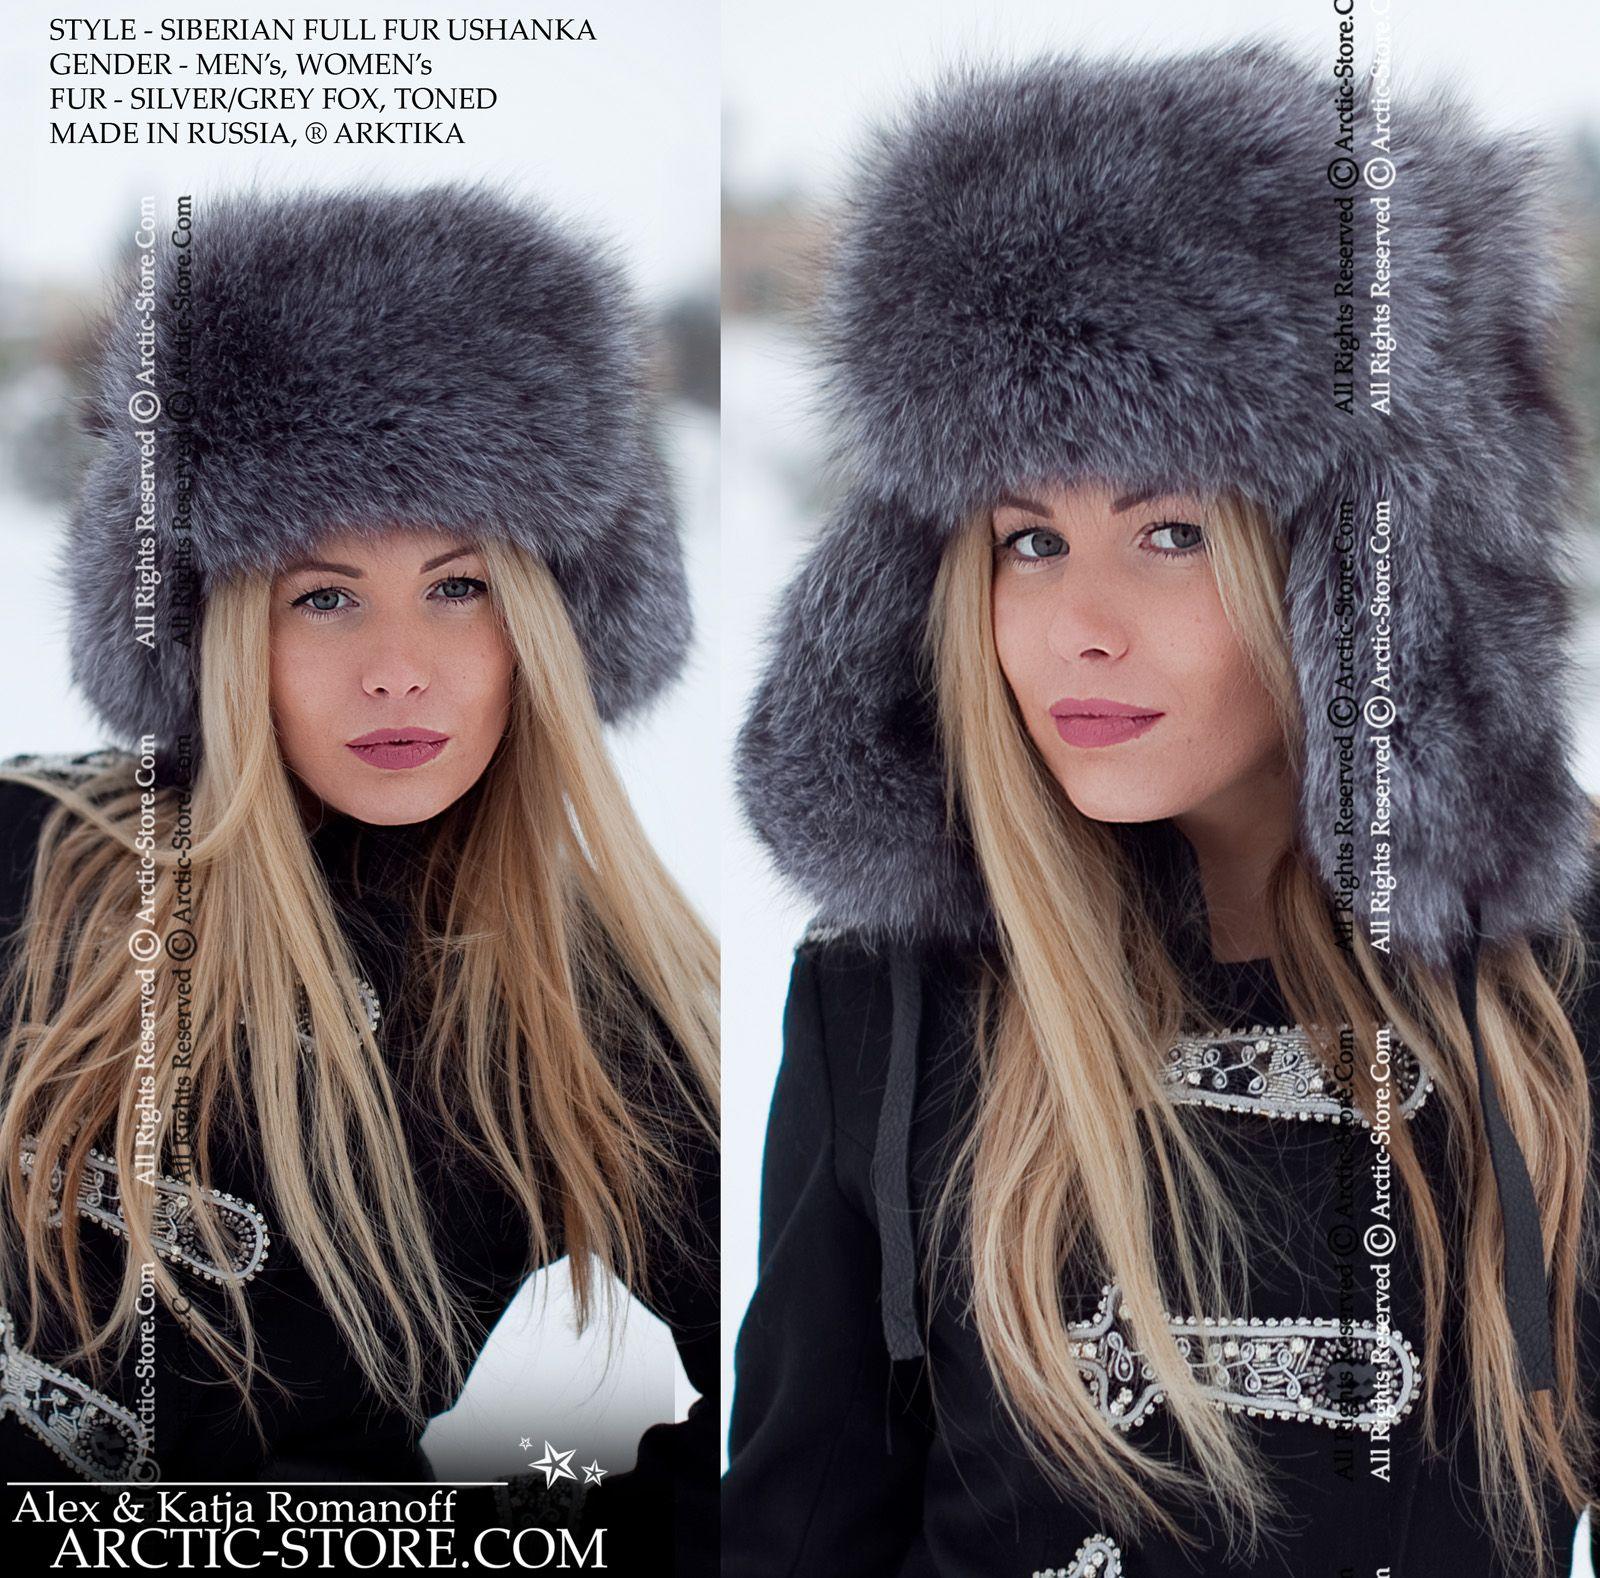 Siberian full fur Ushanka hat 96ad5d9c36a1